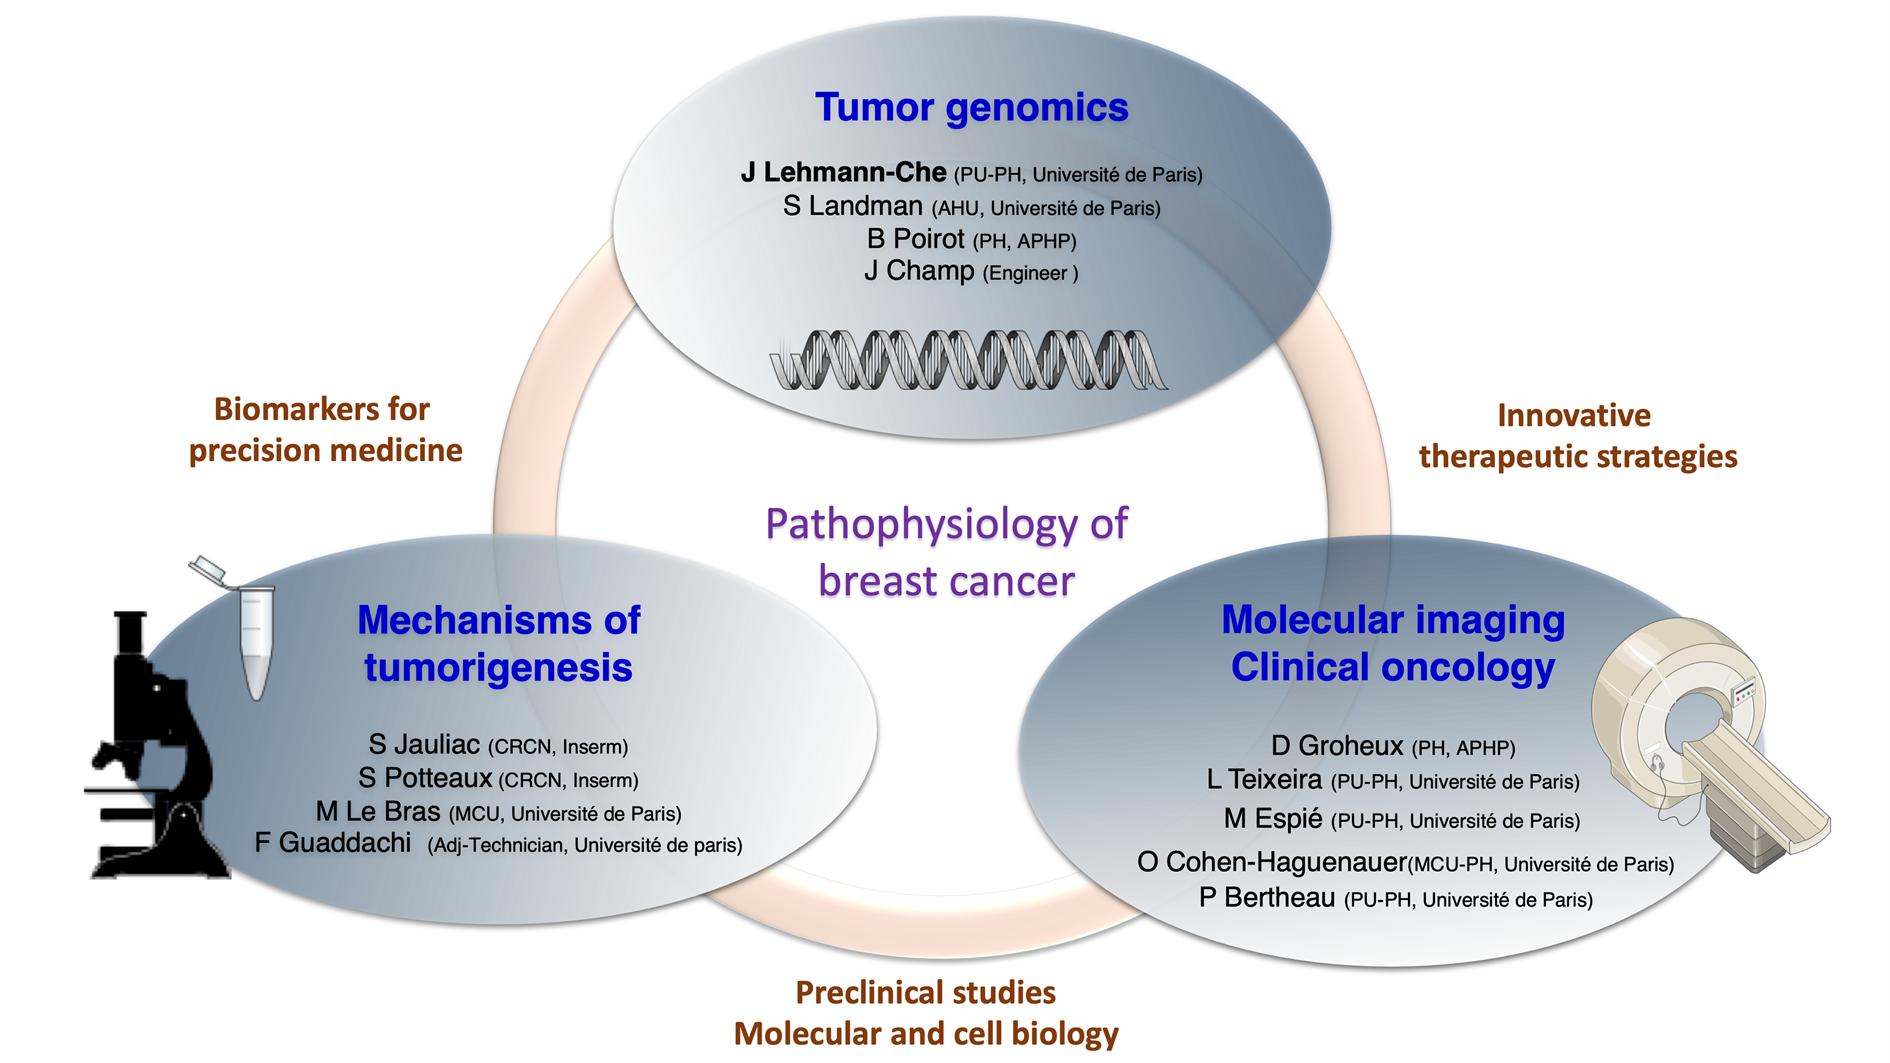 6 : Pathophysiology of breast cancer